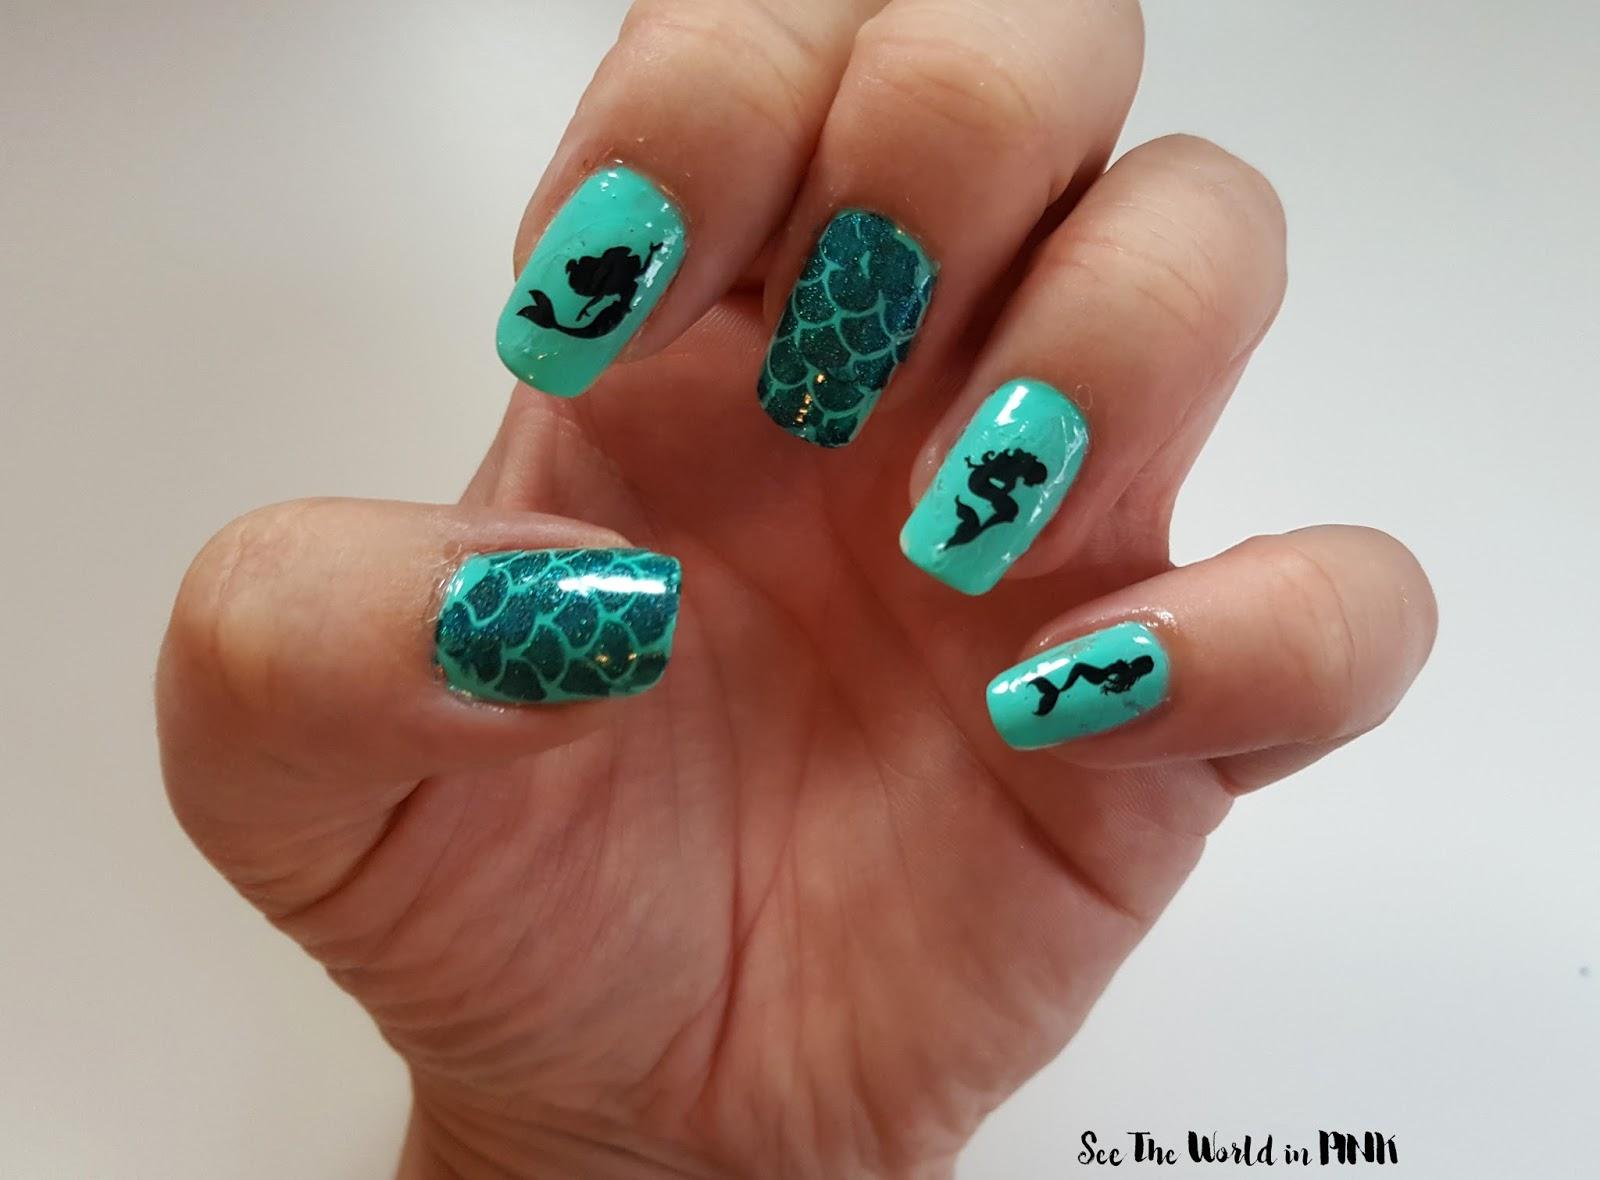 Manicure Monday - Mermaid Nails!